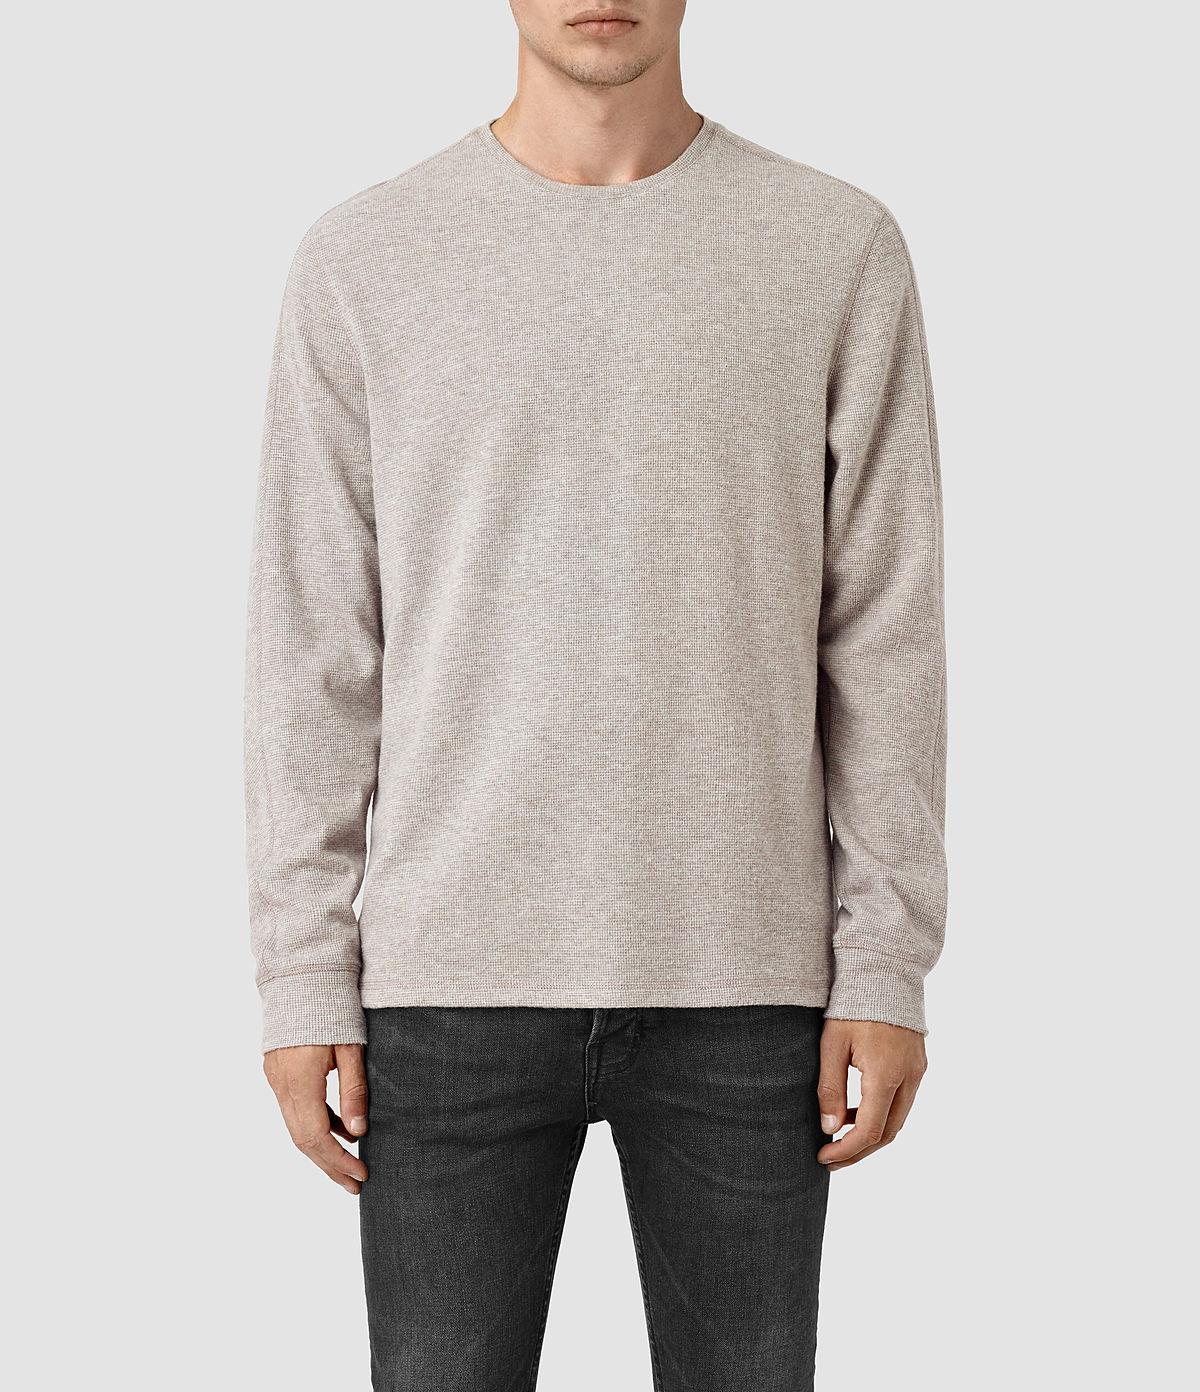 crux-long-sleeve-crew-t-shirt